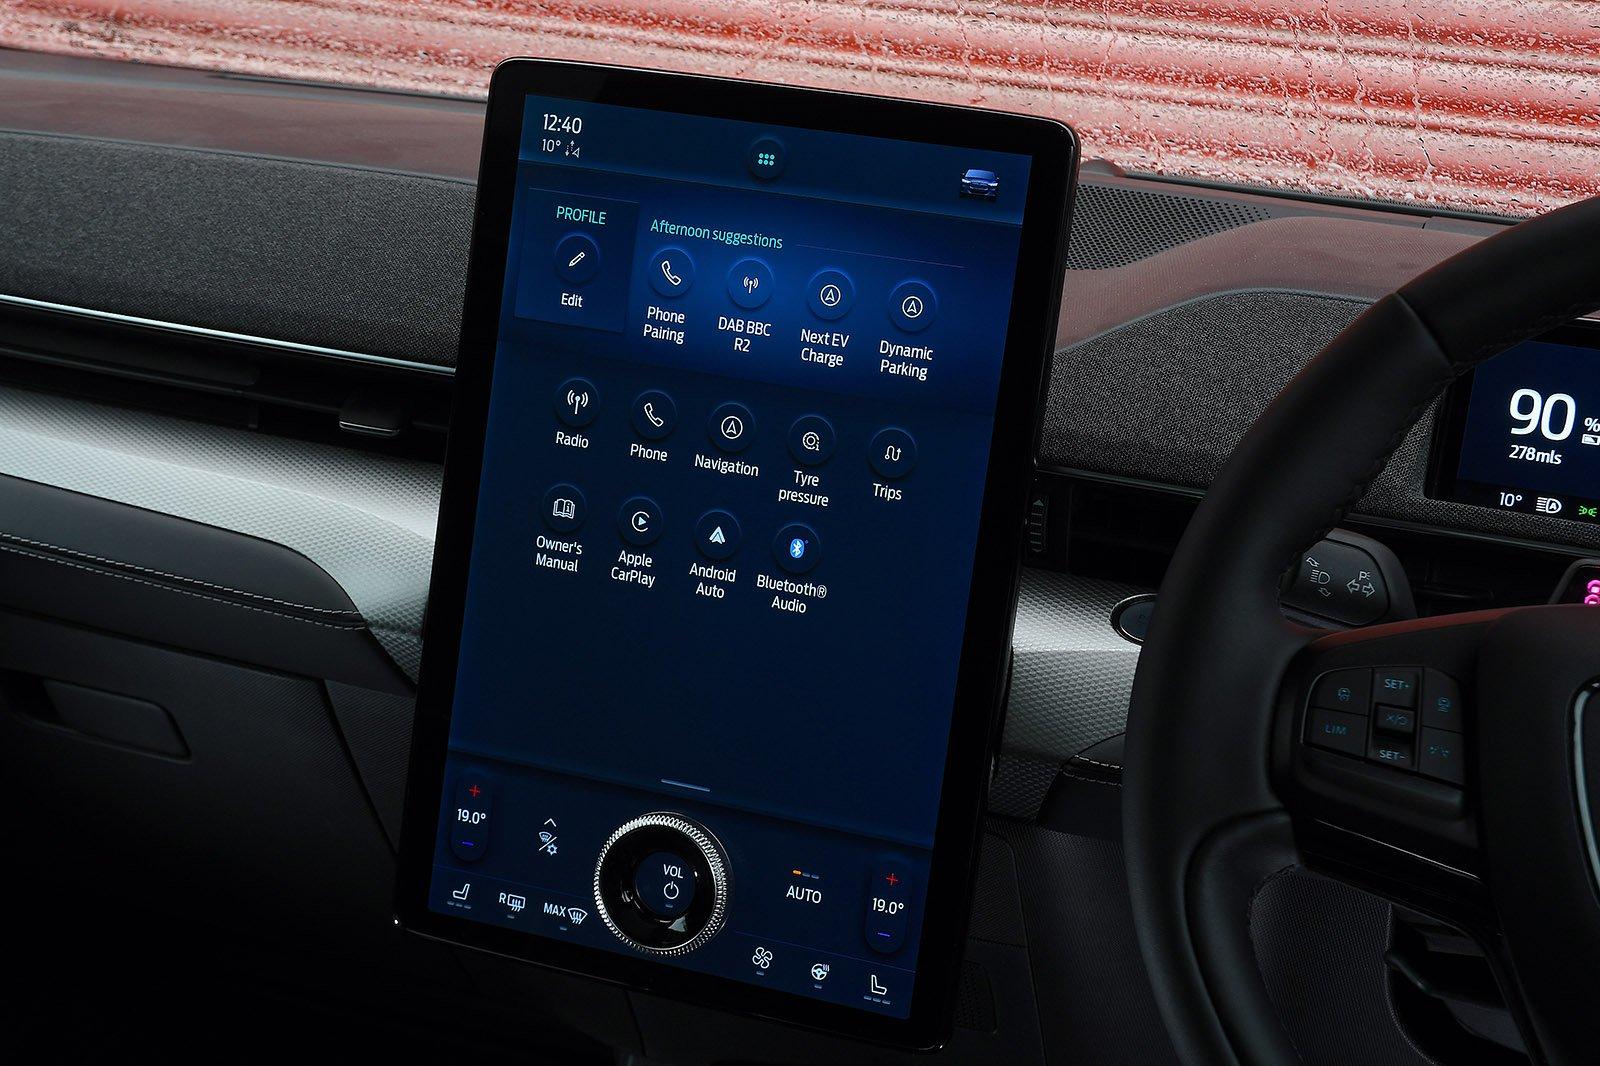 Ford Mustang Mach-E RWD 2021 infotainment screen